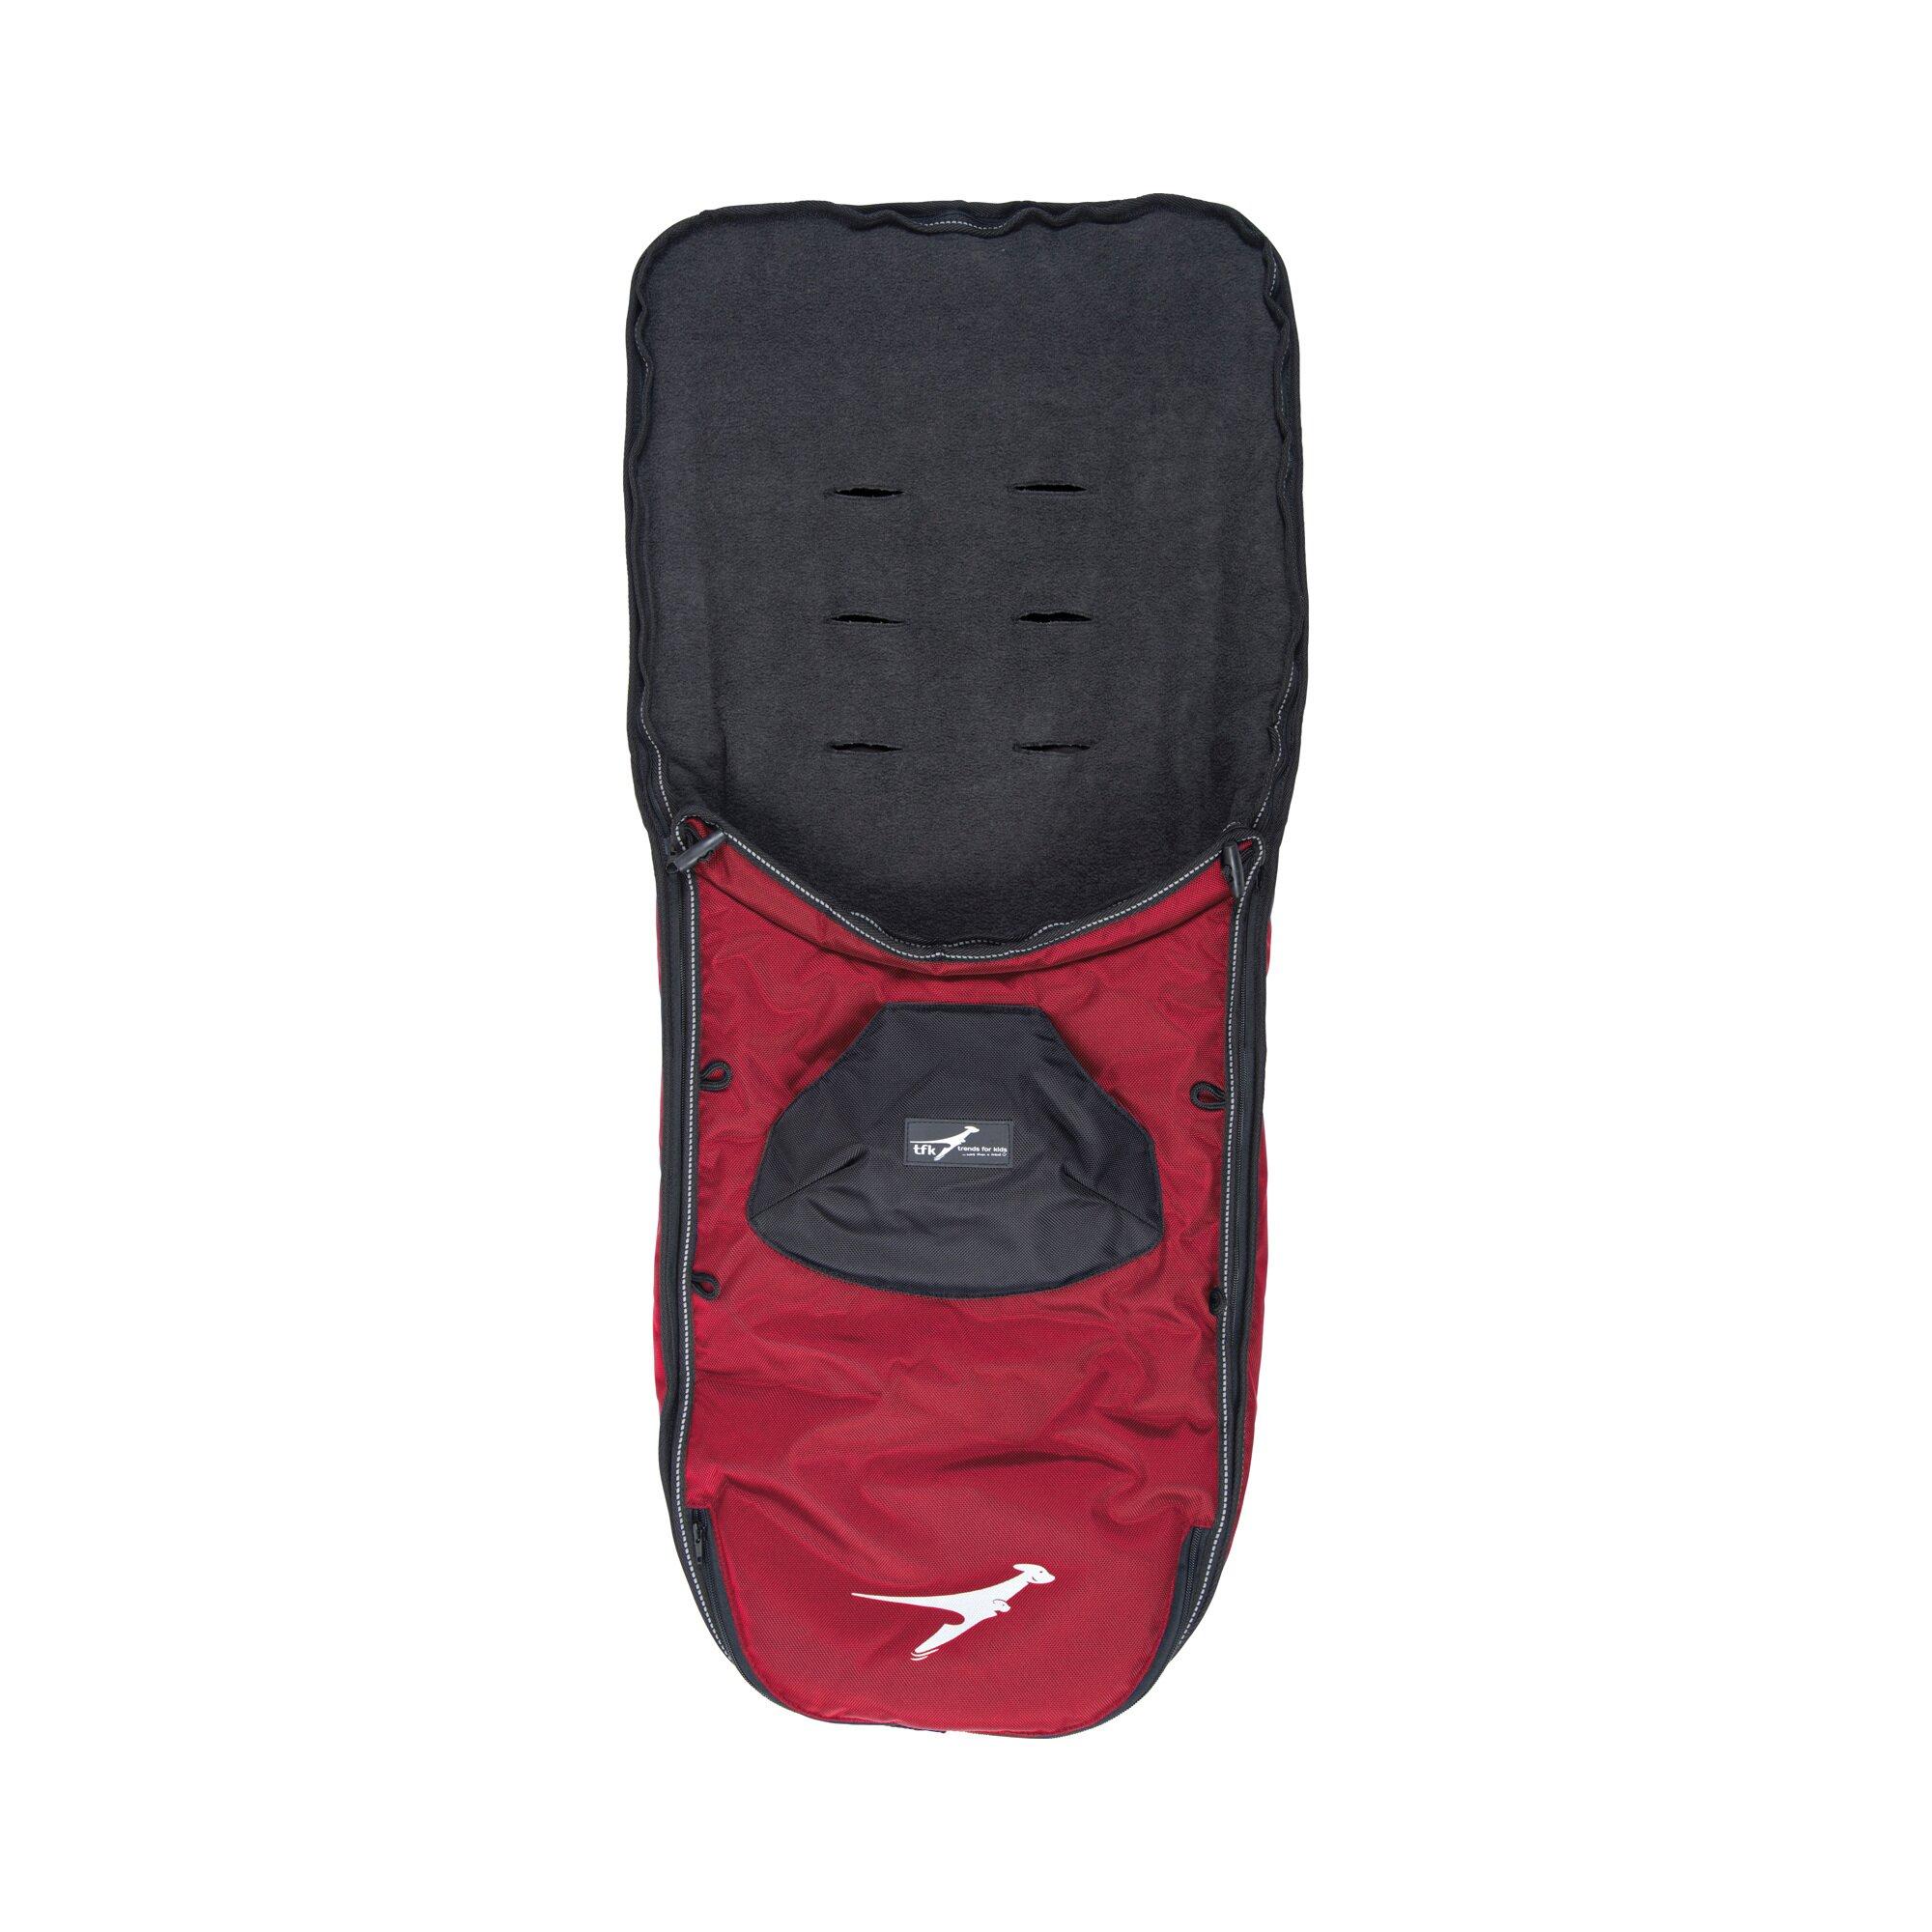 Tfk Winter-Fußsack für Kinderwagen Sportwagen Joggster III, Joggster Twist, Twinner Twist, Buggster S, Joggster X, X II rot